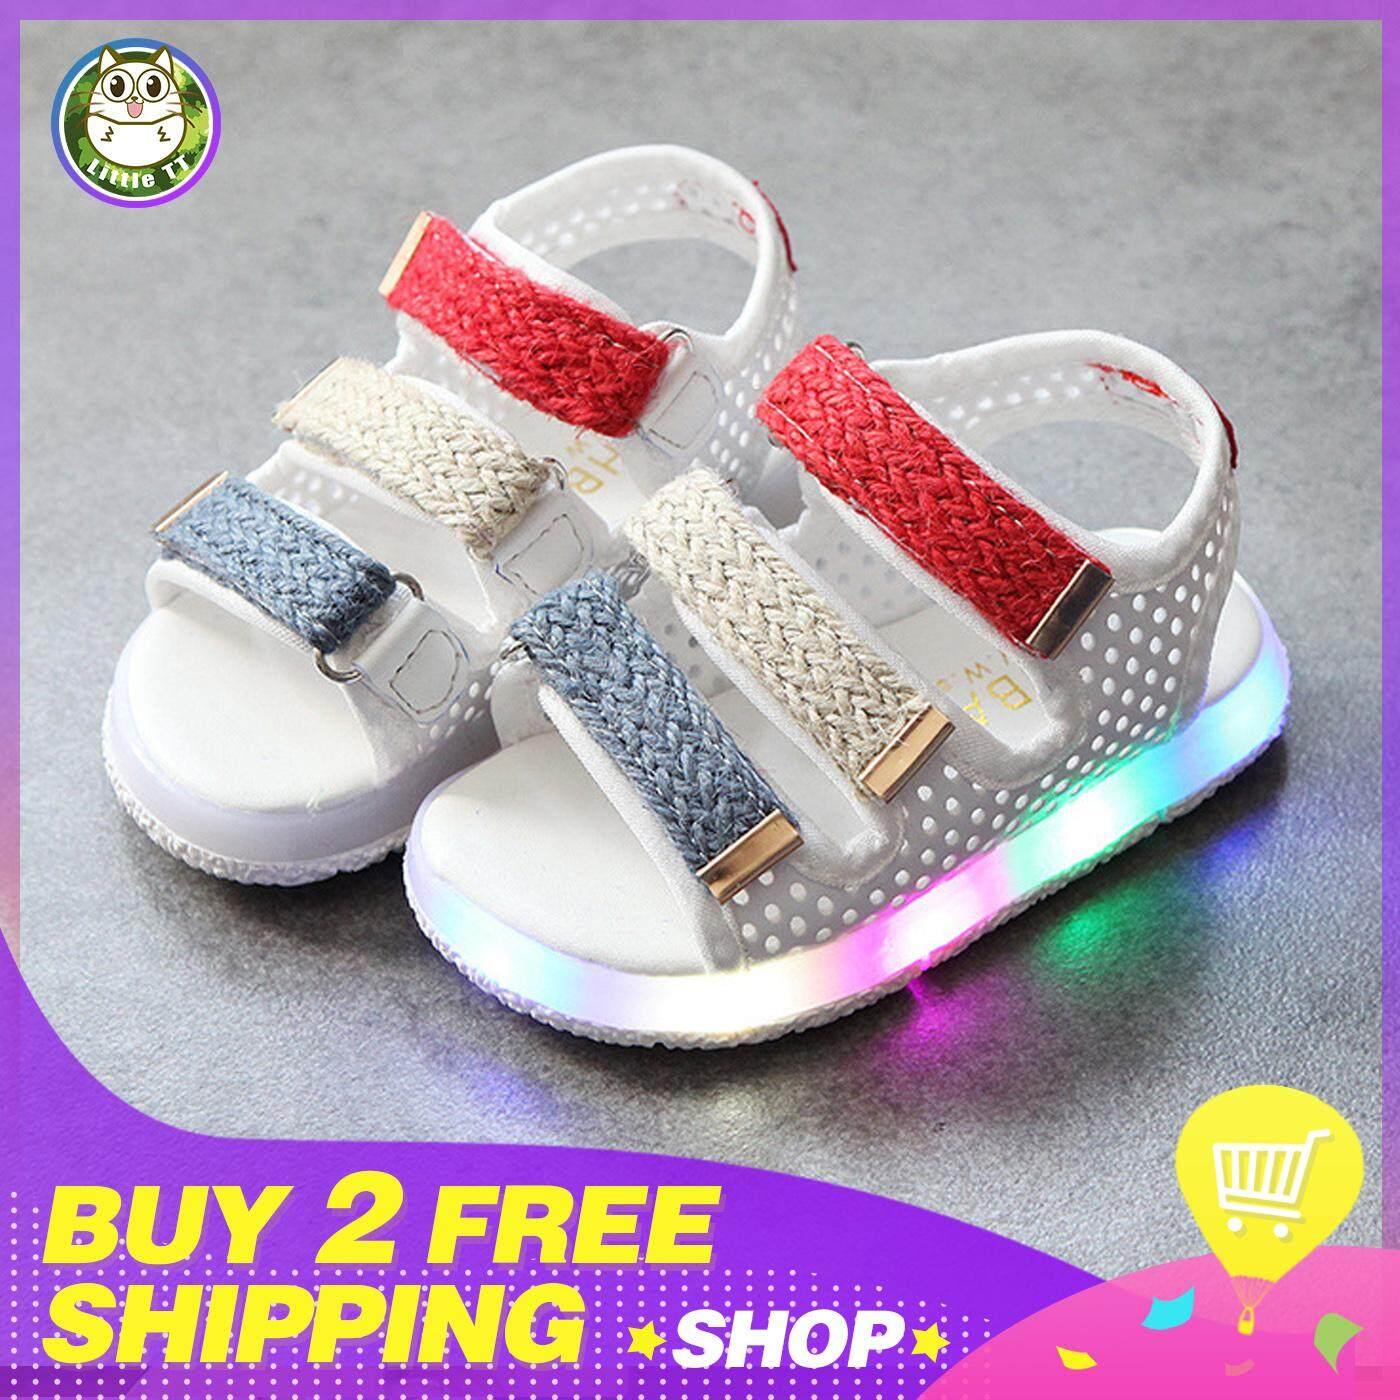 fbfebf6c42752 Little TT 2019 Summer Children Led Light Shoes Boy Sandals Girls Sandals  Color Korean-style Hollow Breathable Kids Shoes 2 3 4 5 Years Old